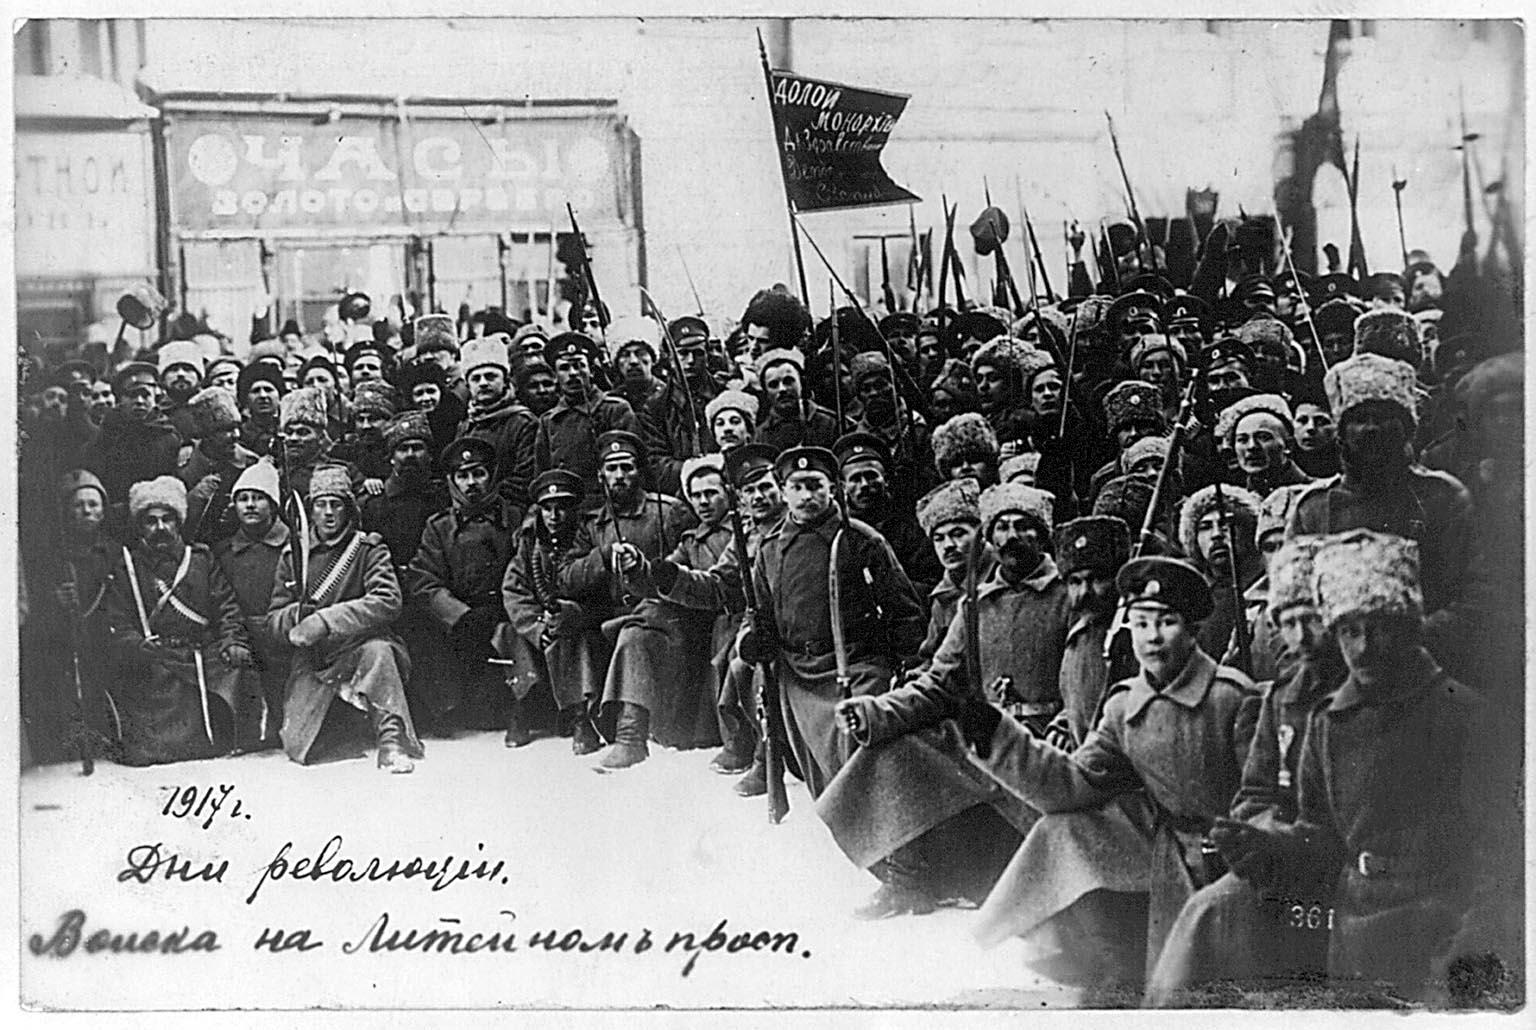 10 Войска на Литейном проспекте